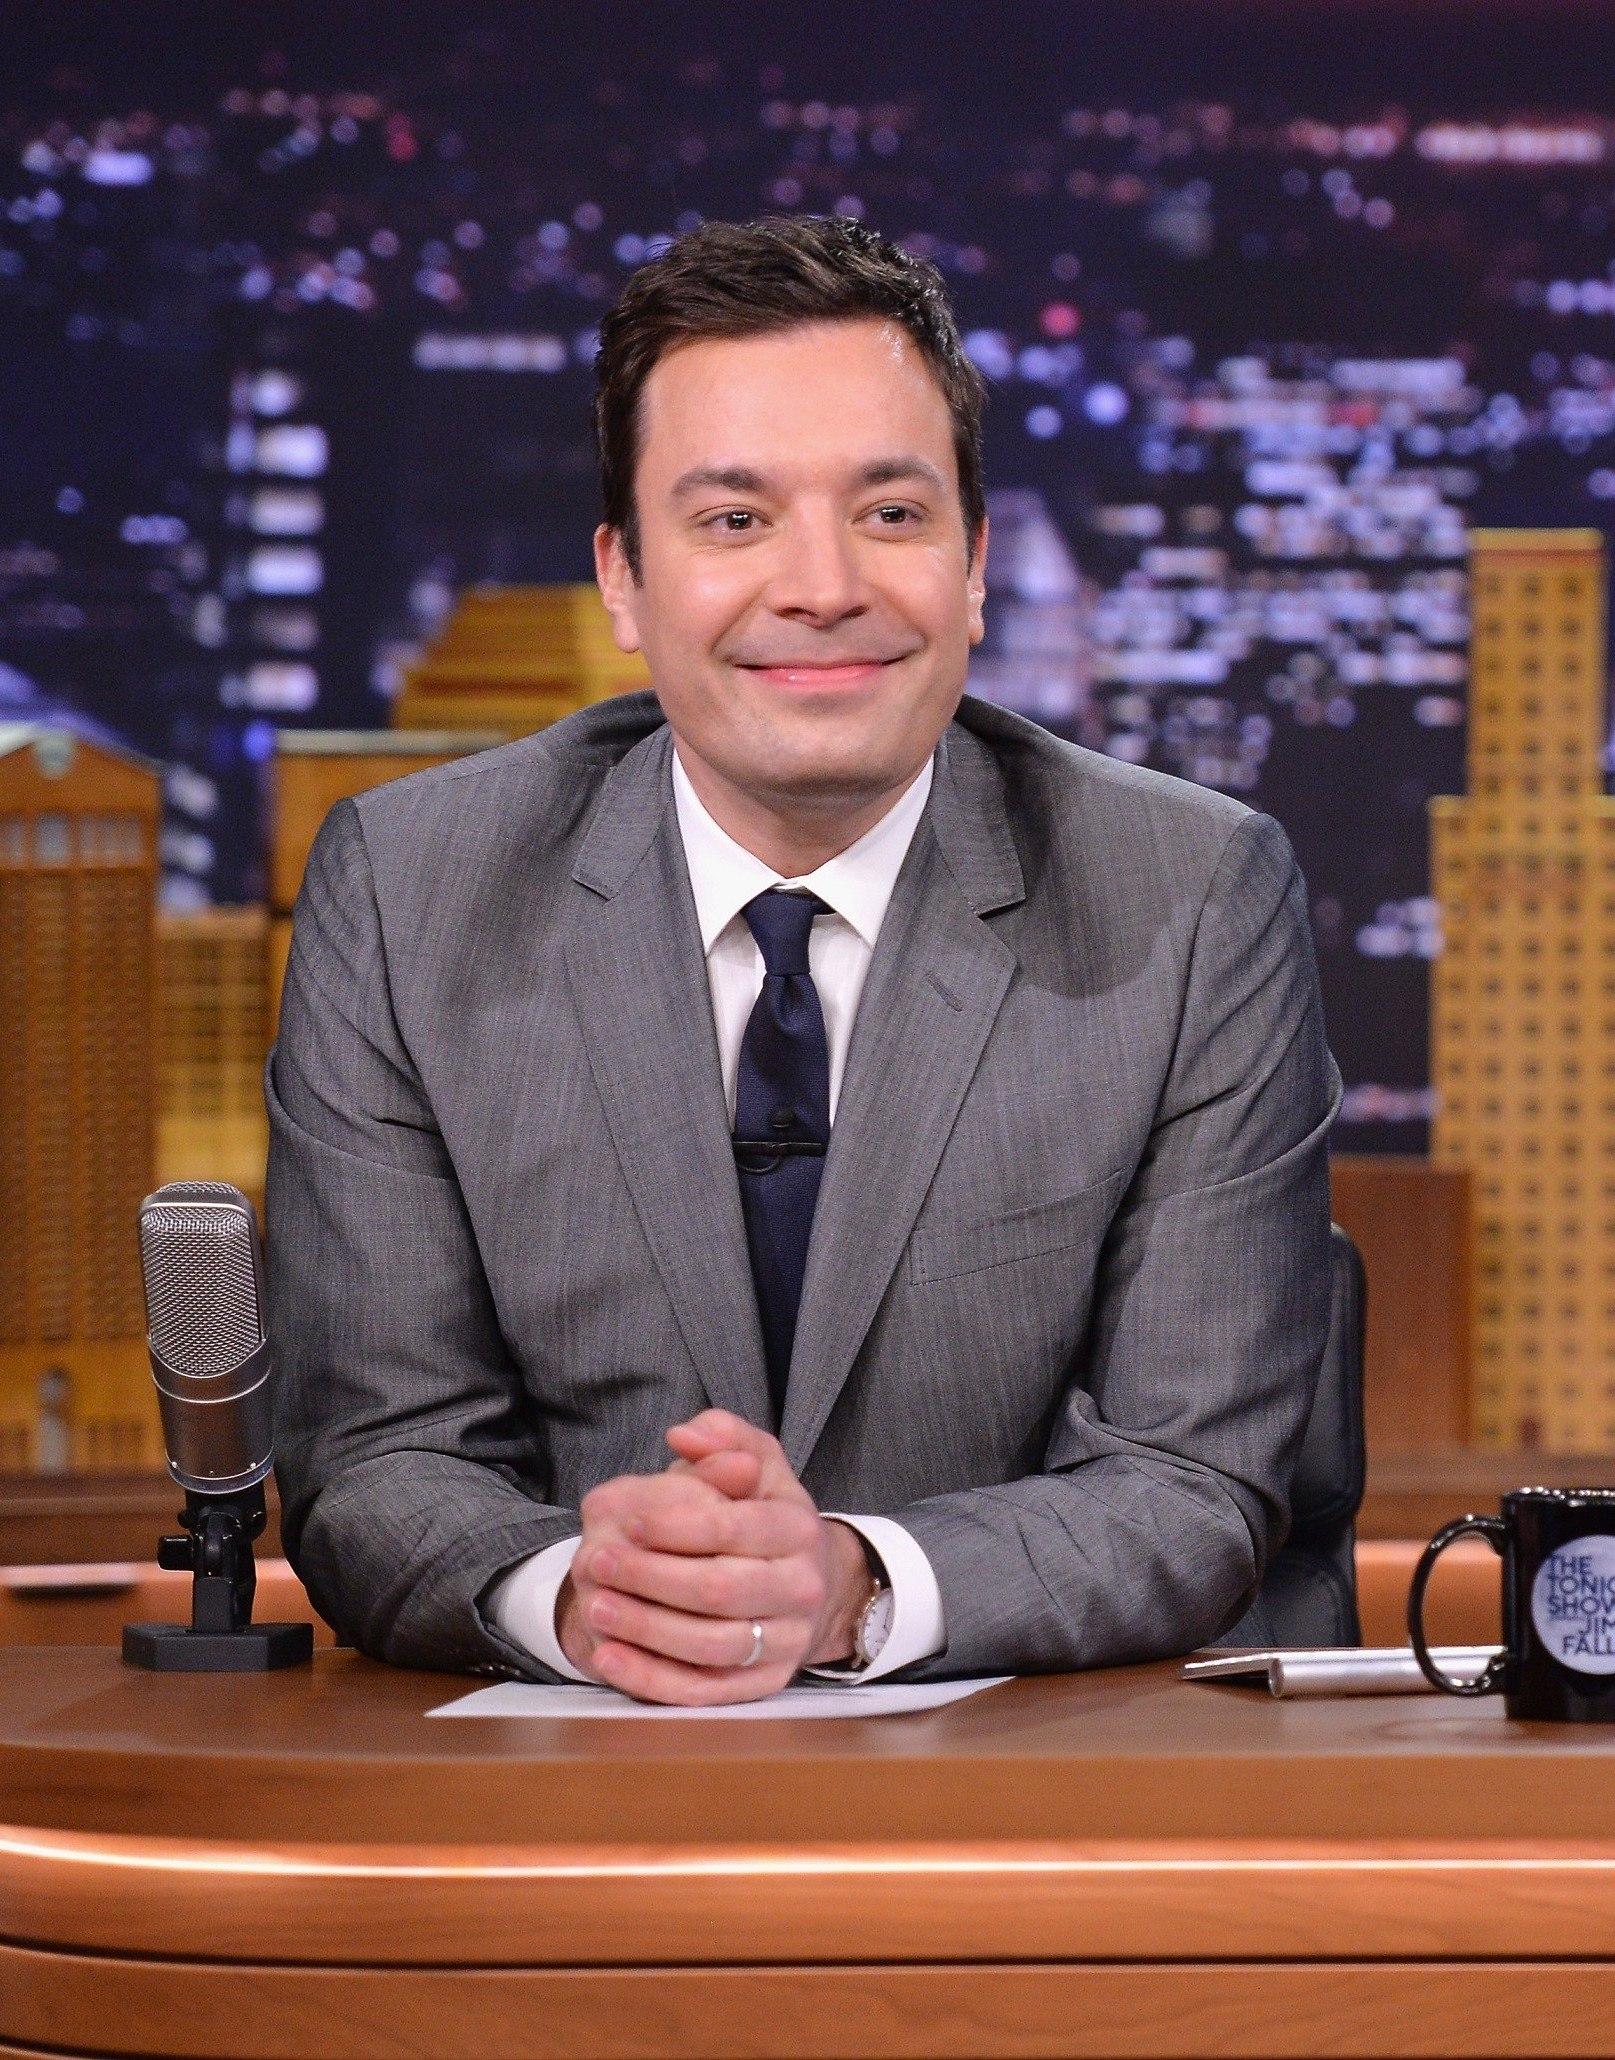 Jimmy Fallon hosting The Tonight Show